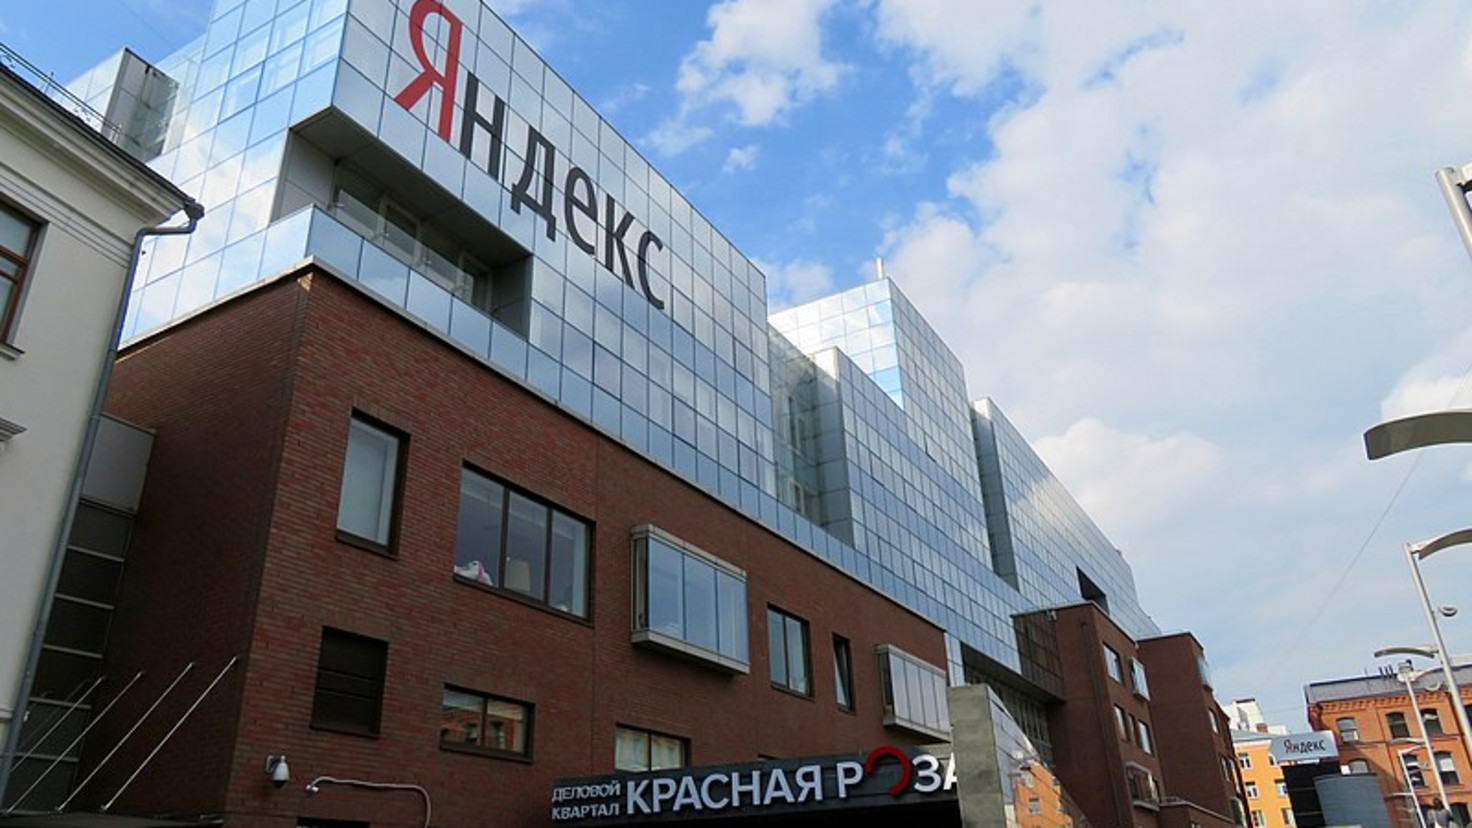 Капитализация Яндекса может вырасти на $1,4 млрд из-за закона о предустановке российского ПО